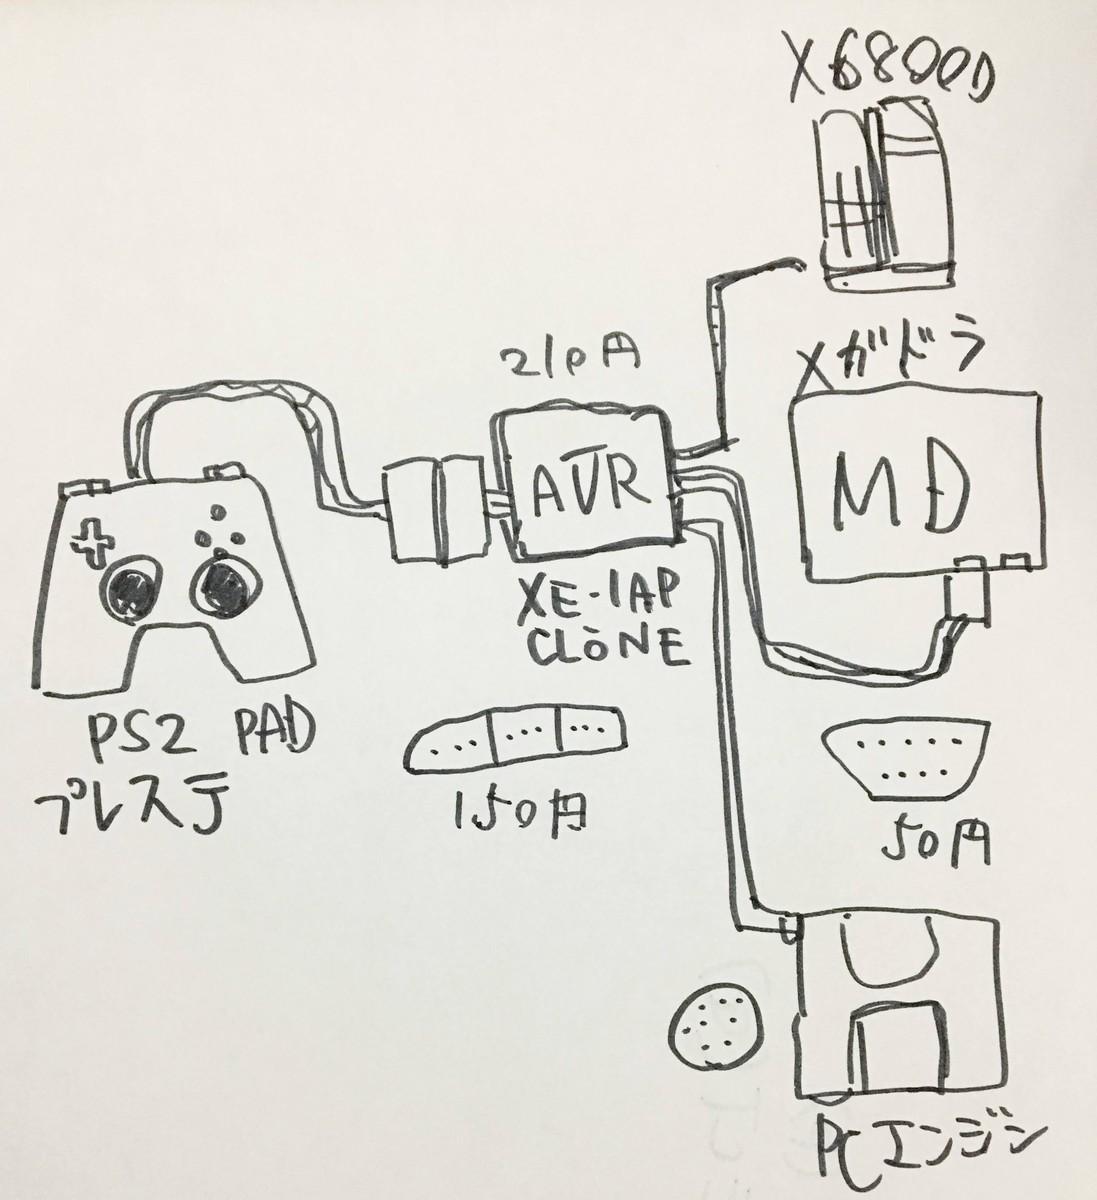 f:id:nicotakuya:20210525033559j:plain